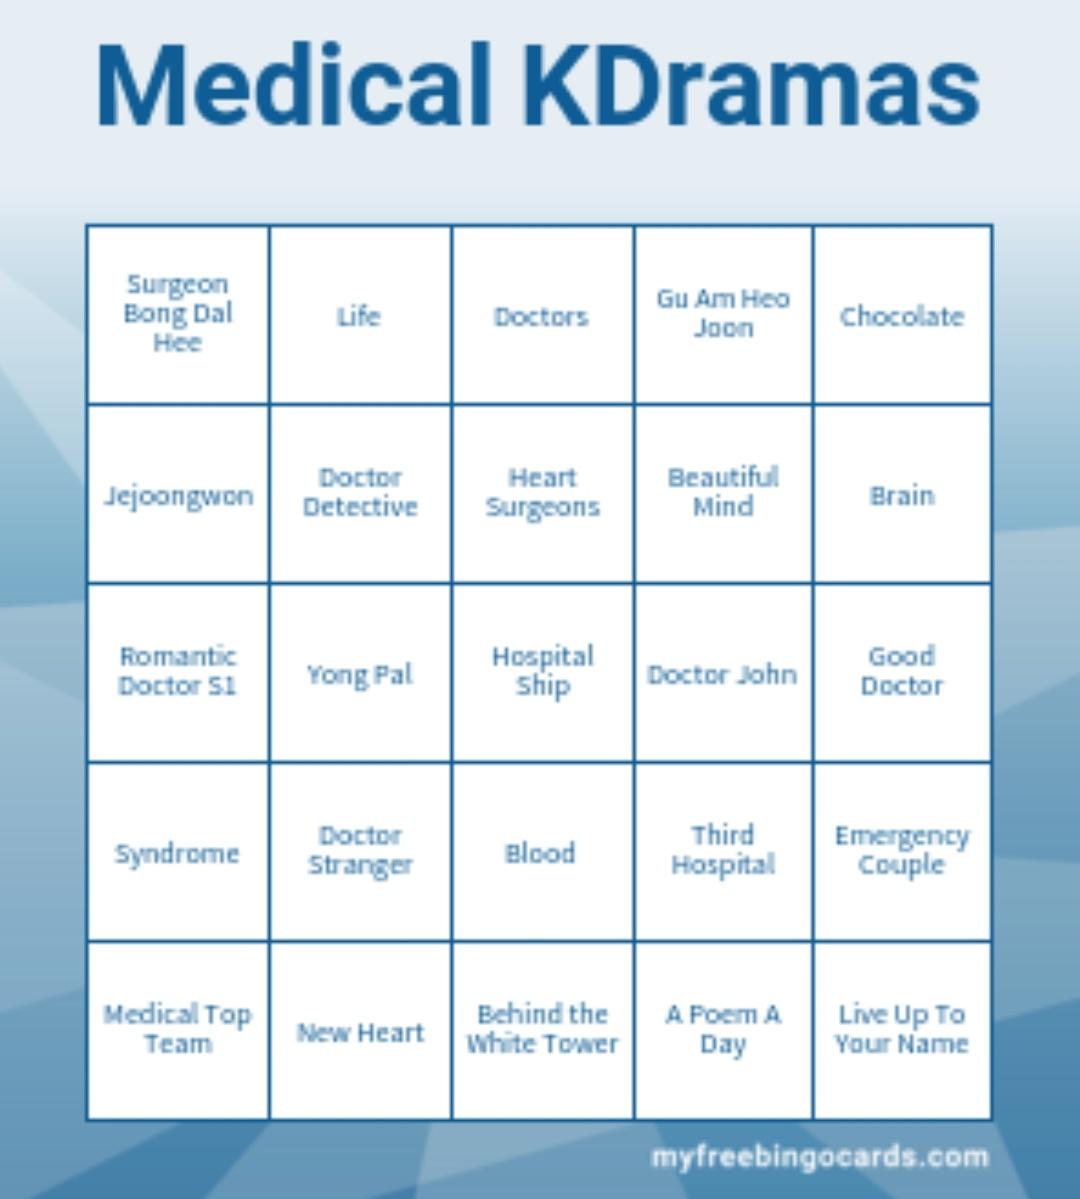 Medical KDrama